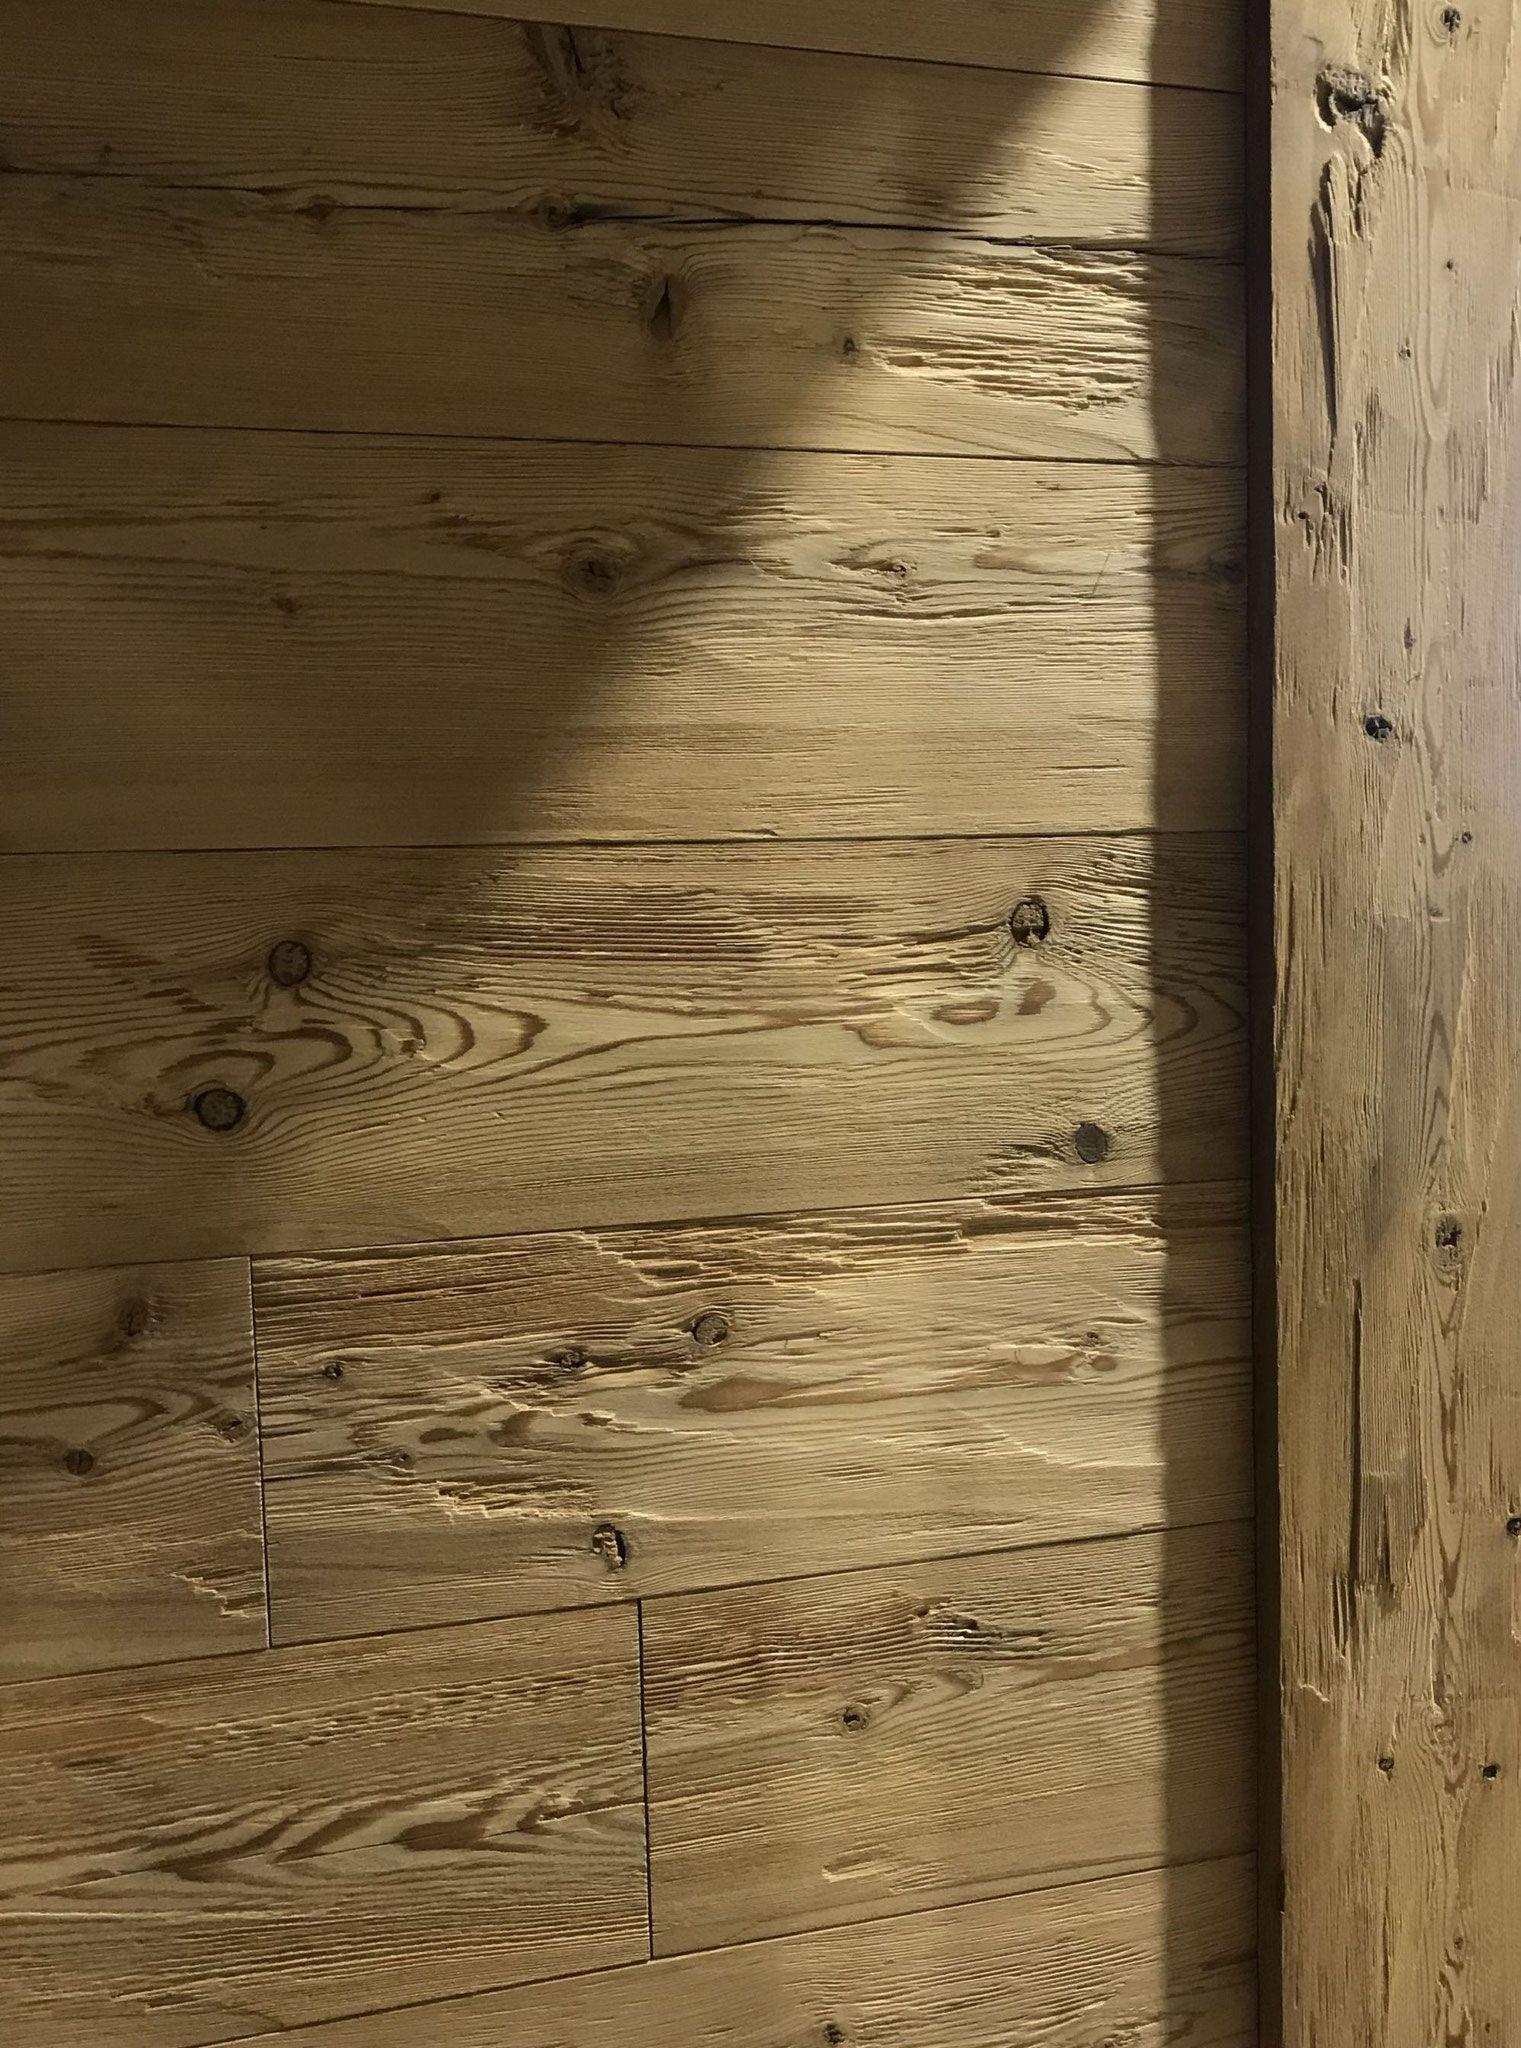 Rustikale Wandverkleidung Larche Gedampft Gehackt Geburstet Vintage Holz In 2020 Altholz Wandverkleidung Wandverkleidung Altholz